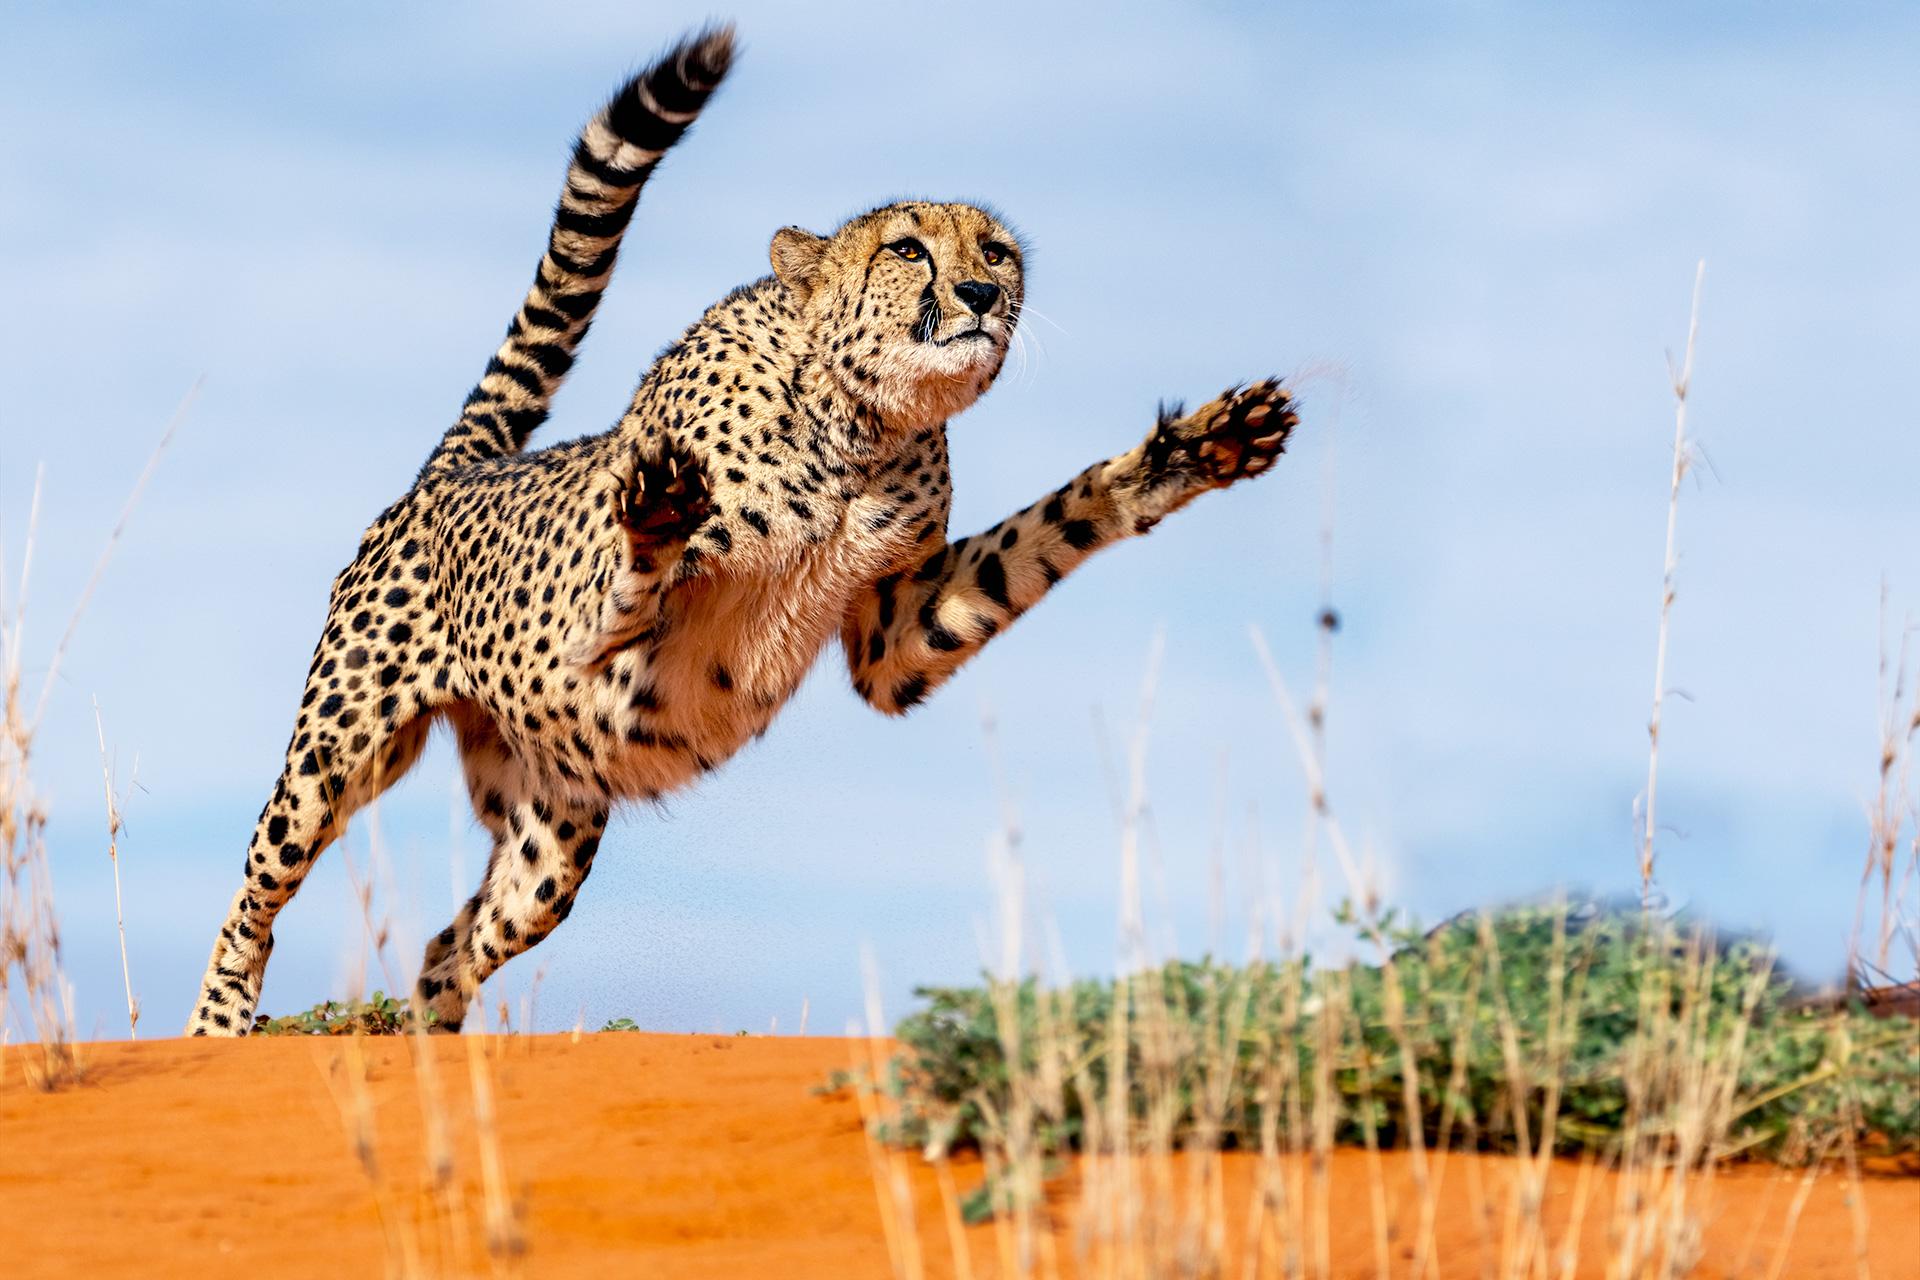 Fotoreise-Fotosafari-hd-2021-001-Namibia